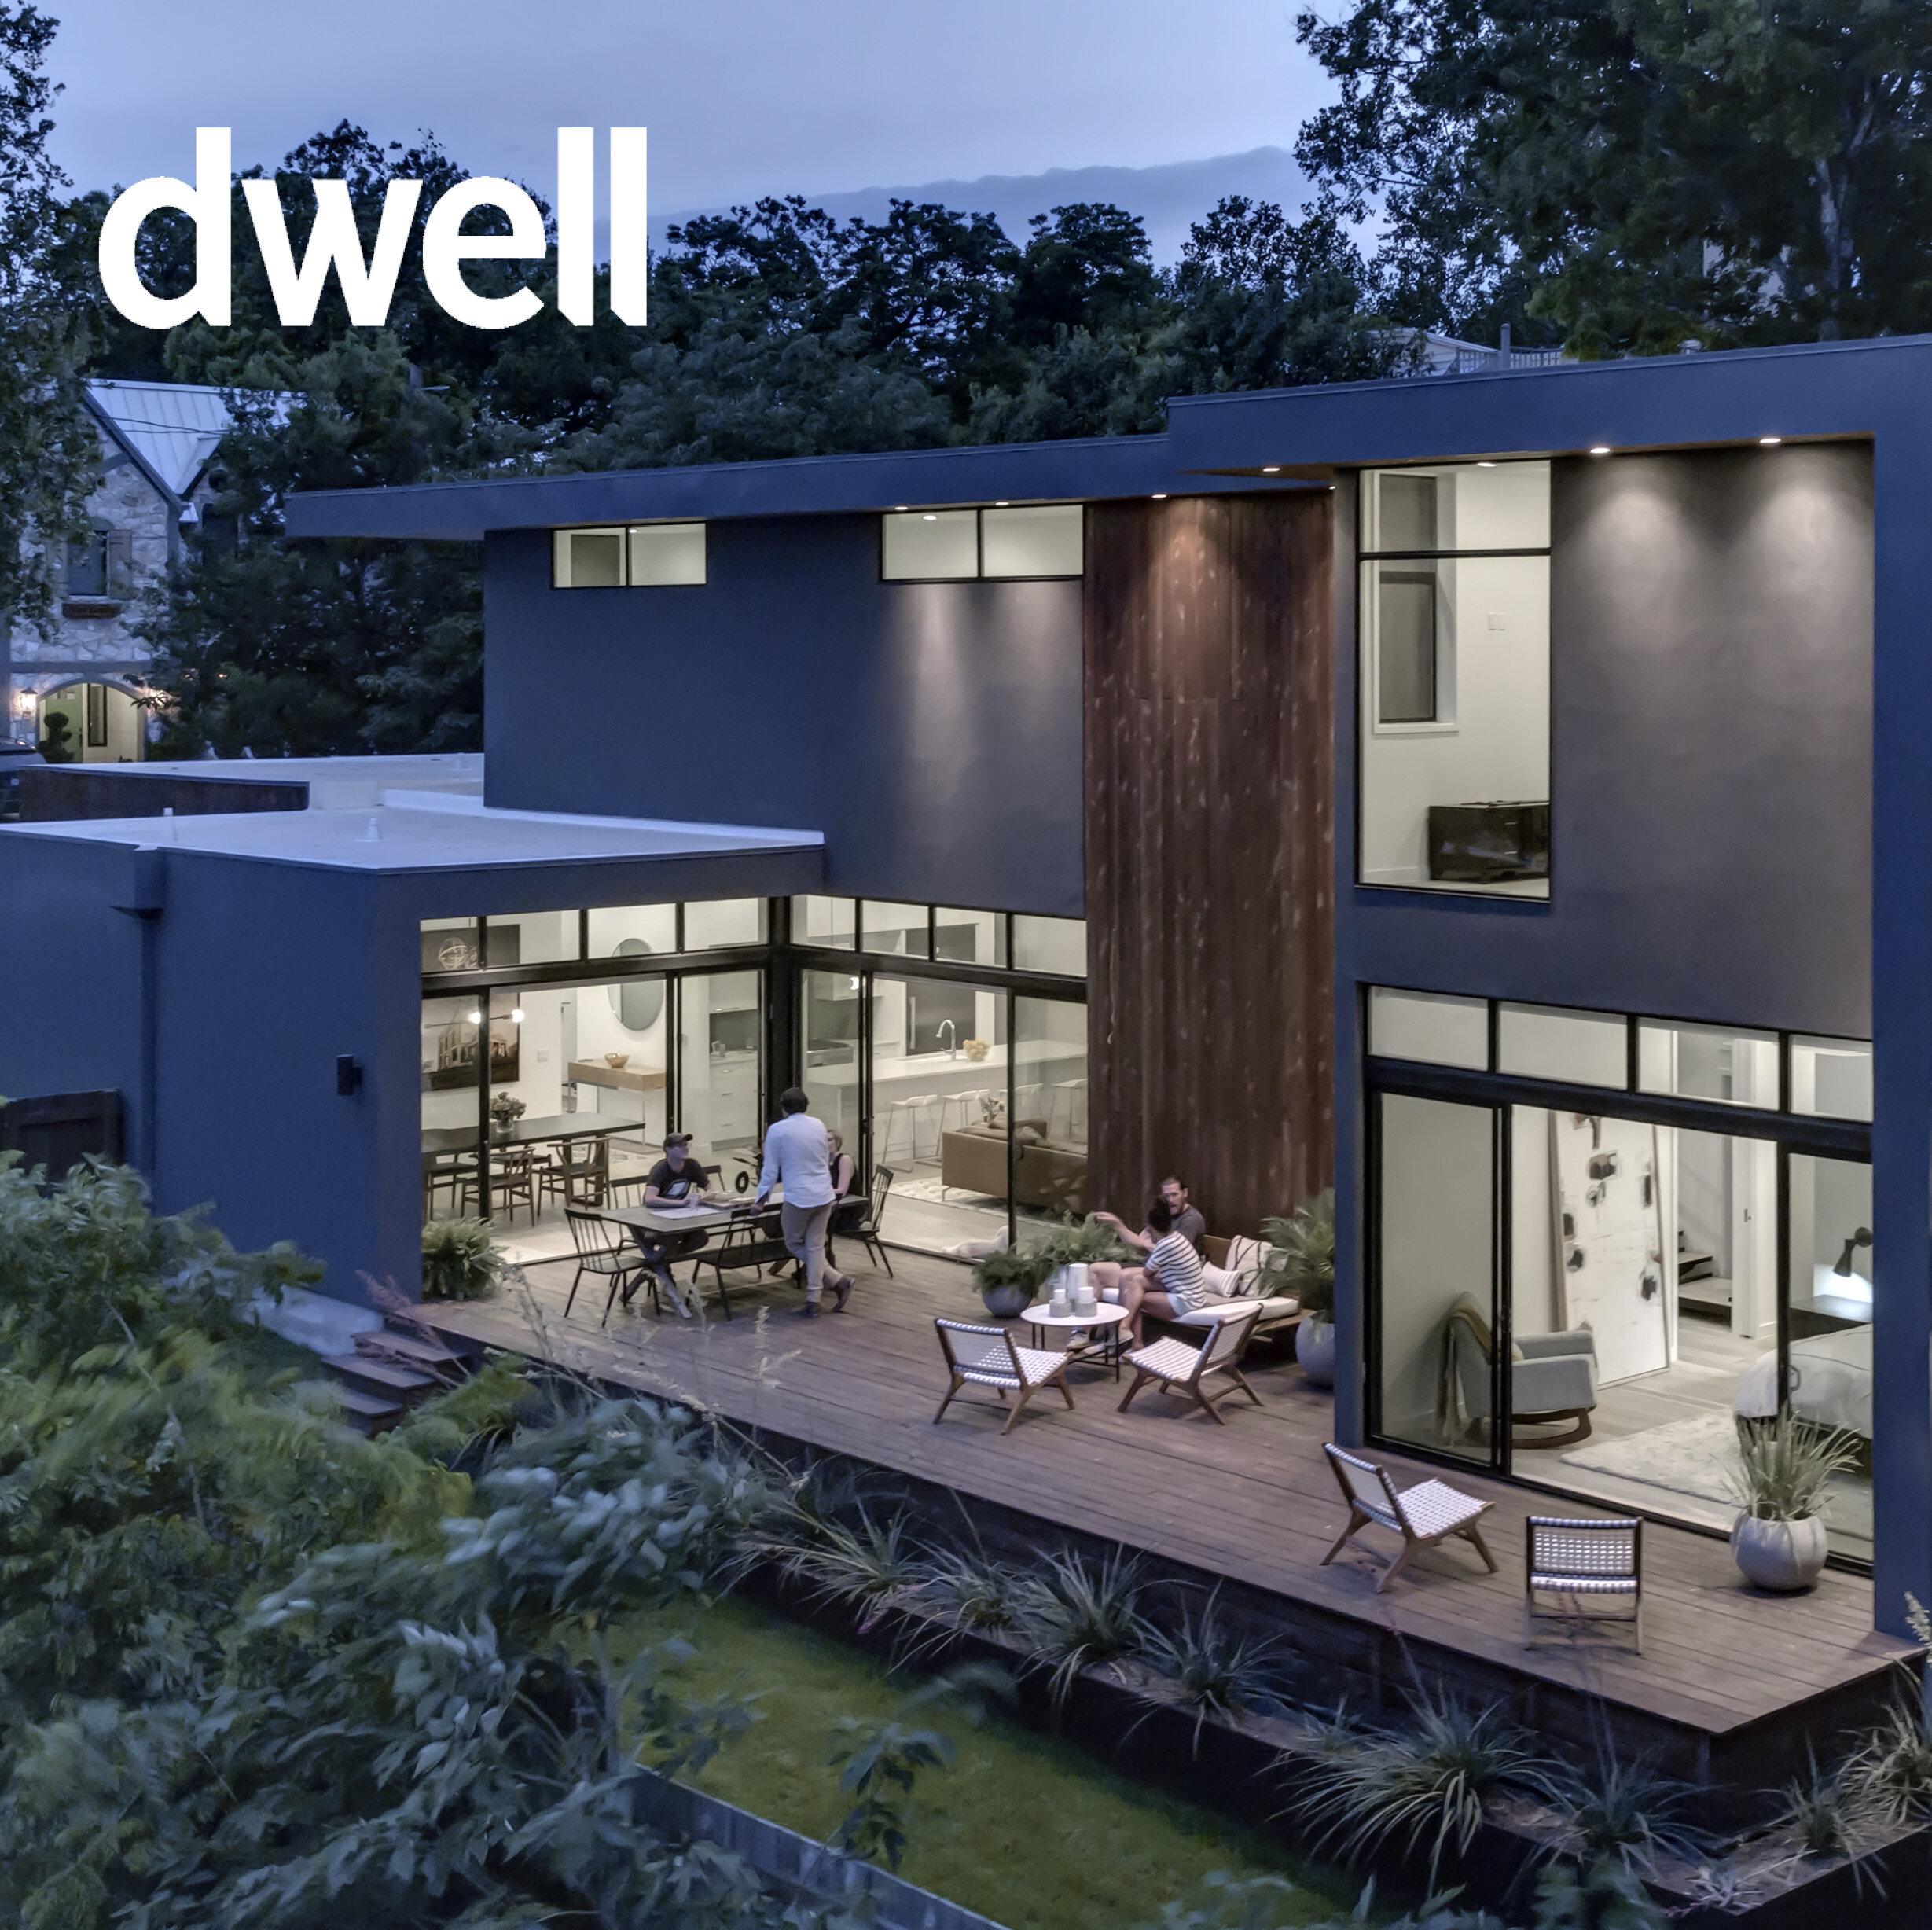 Dwell_2019_10_AddSubtract